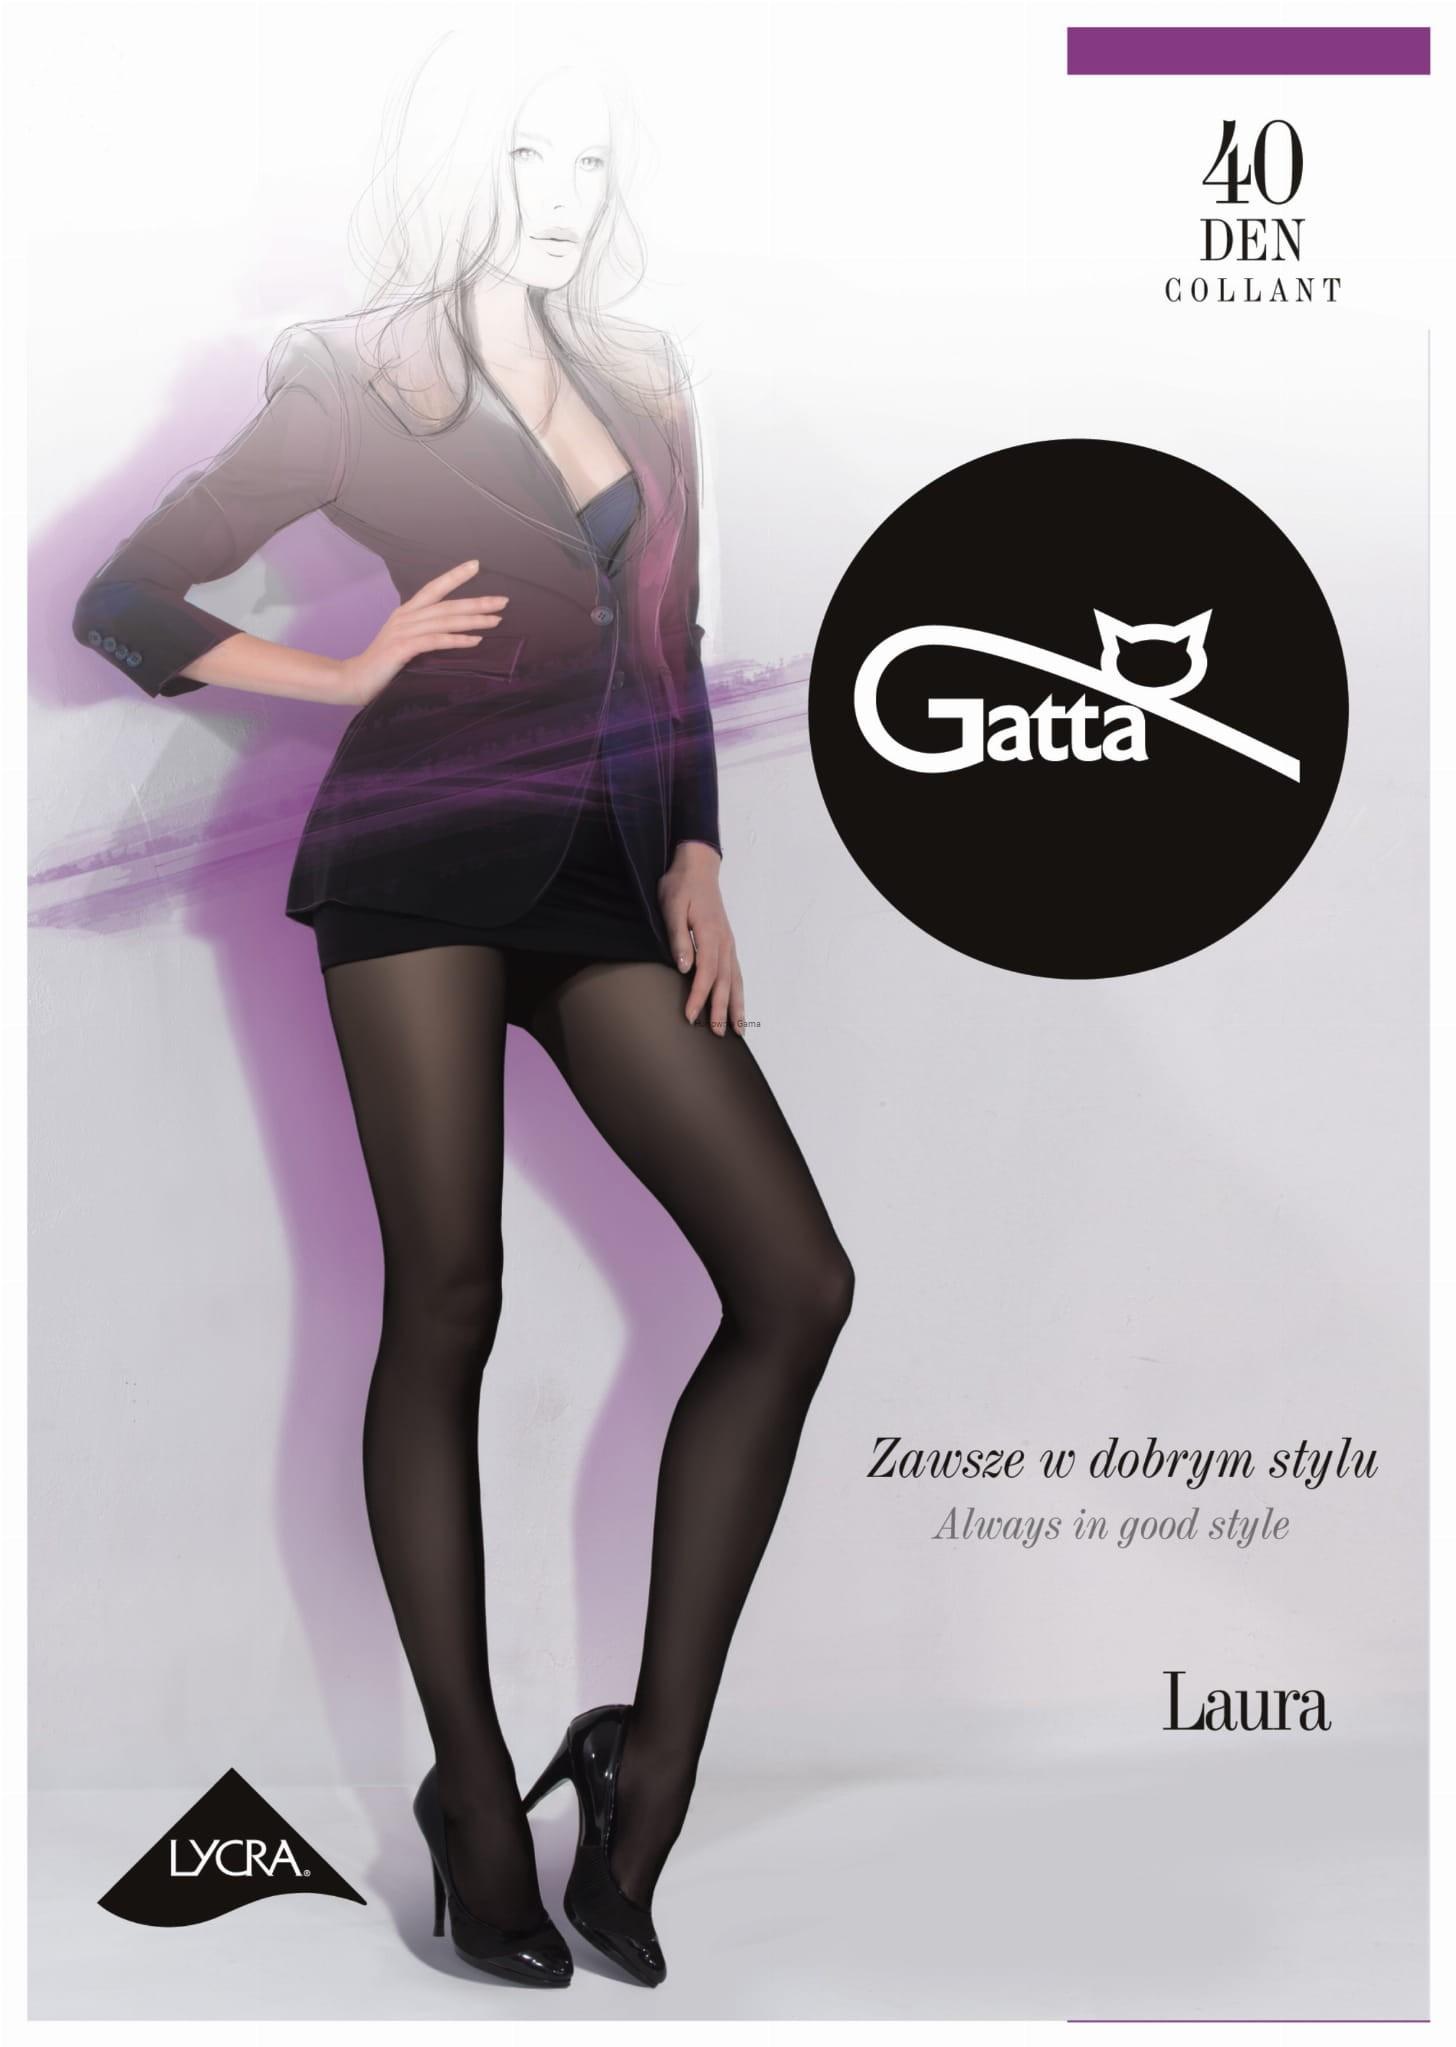 e2faf74e284709 Rajstopy Gatta Laura 40 den sklep internetowy GAMA - rajstopy ...